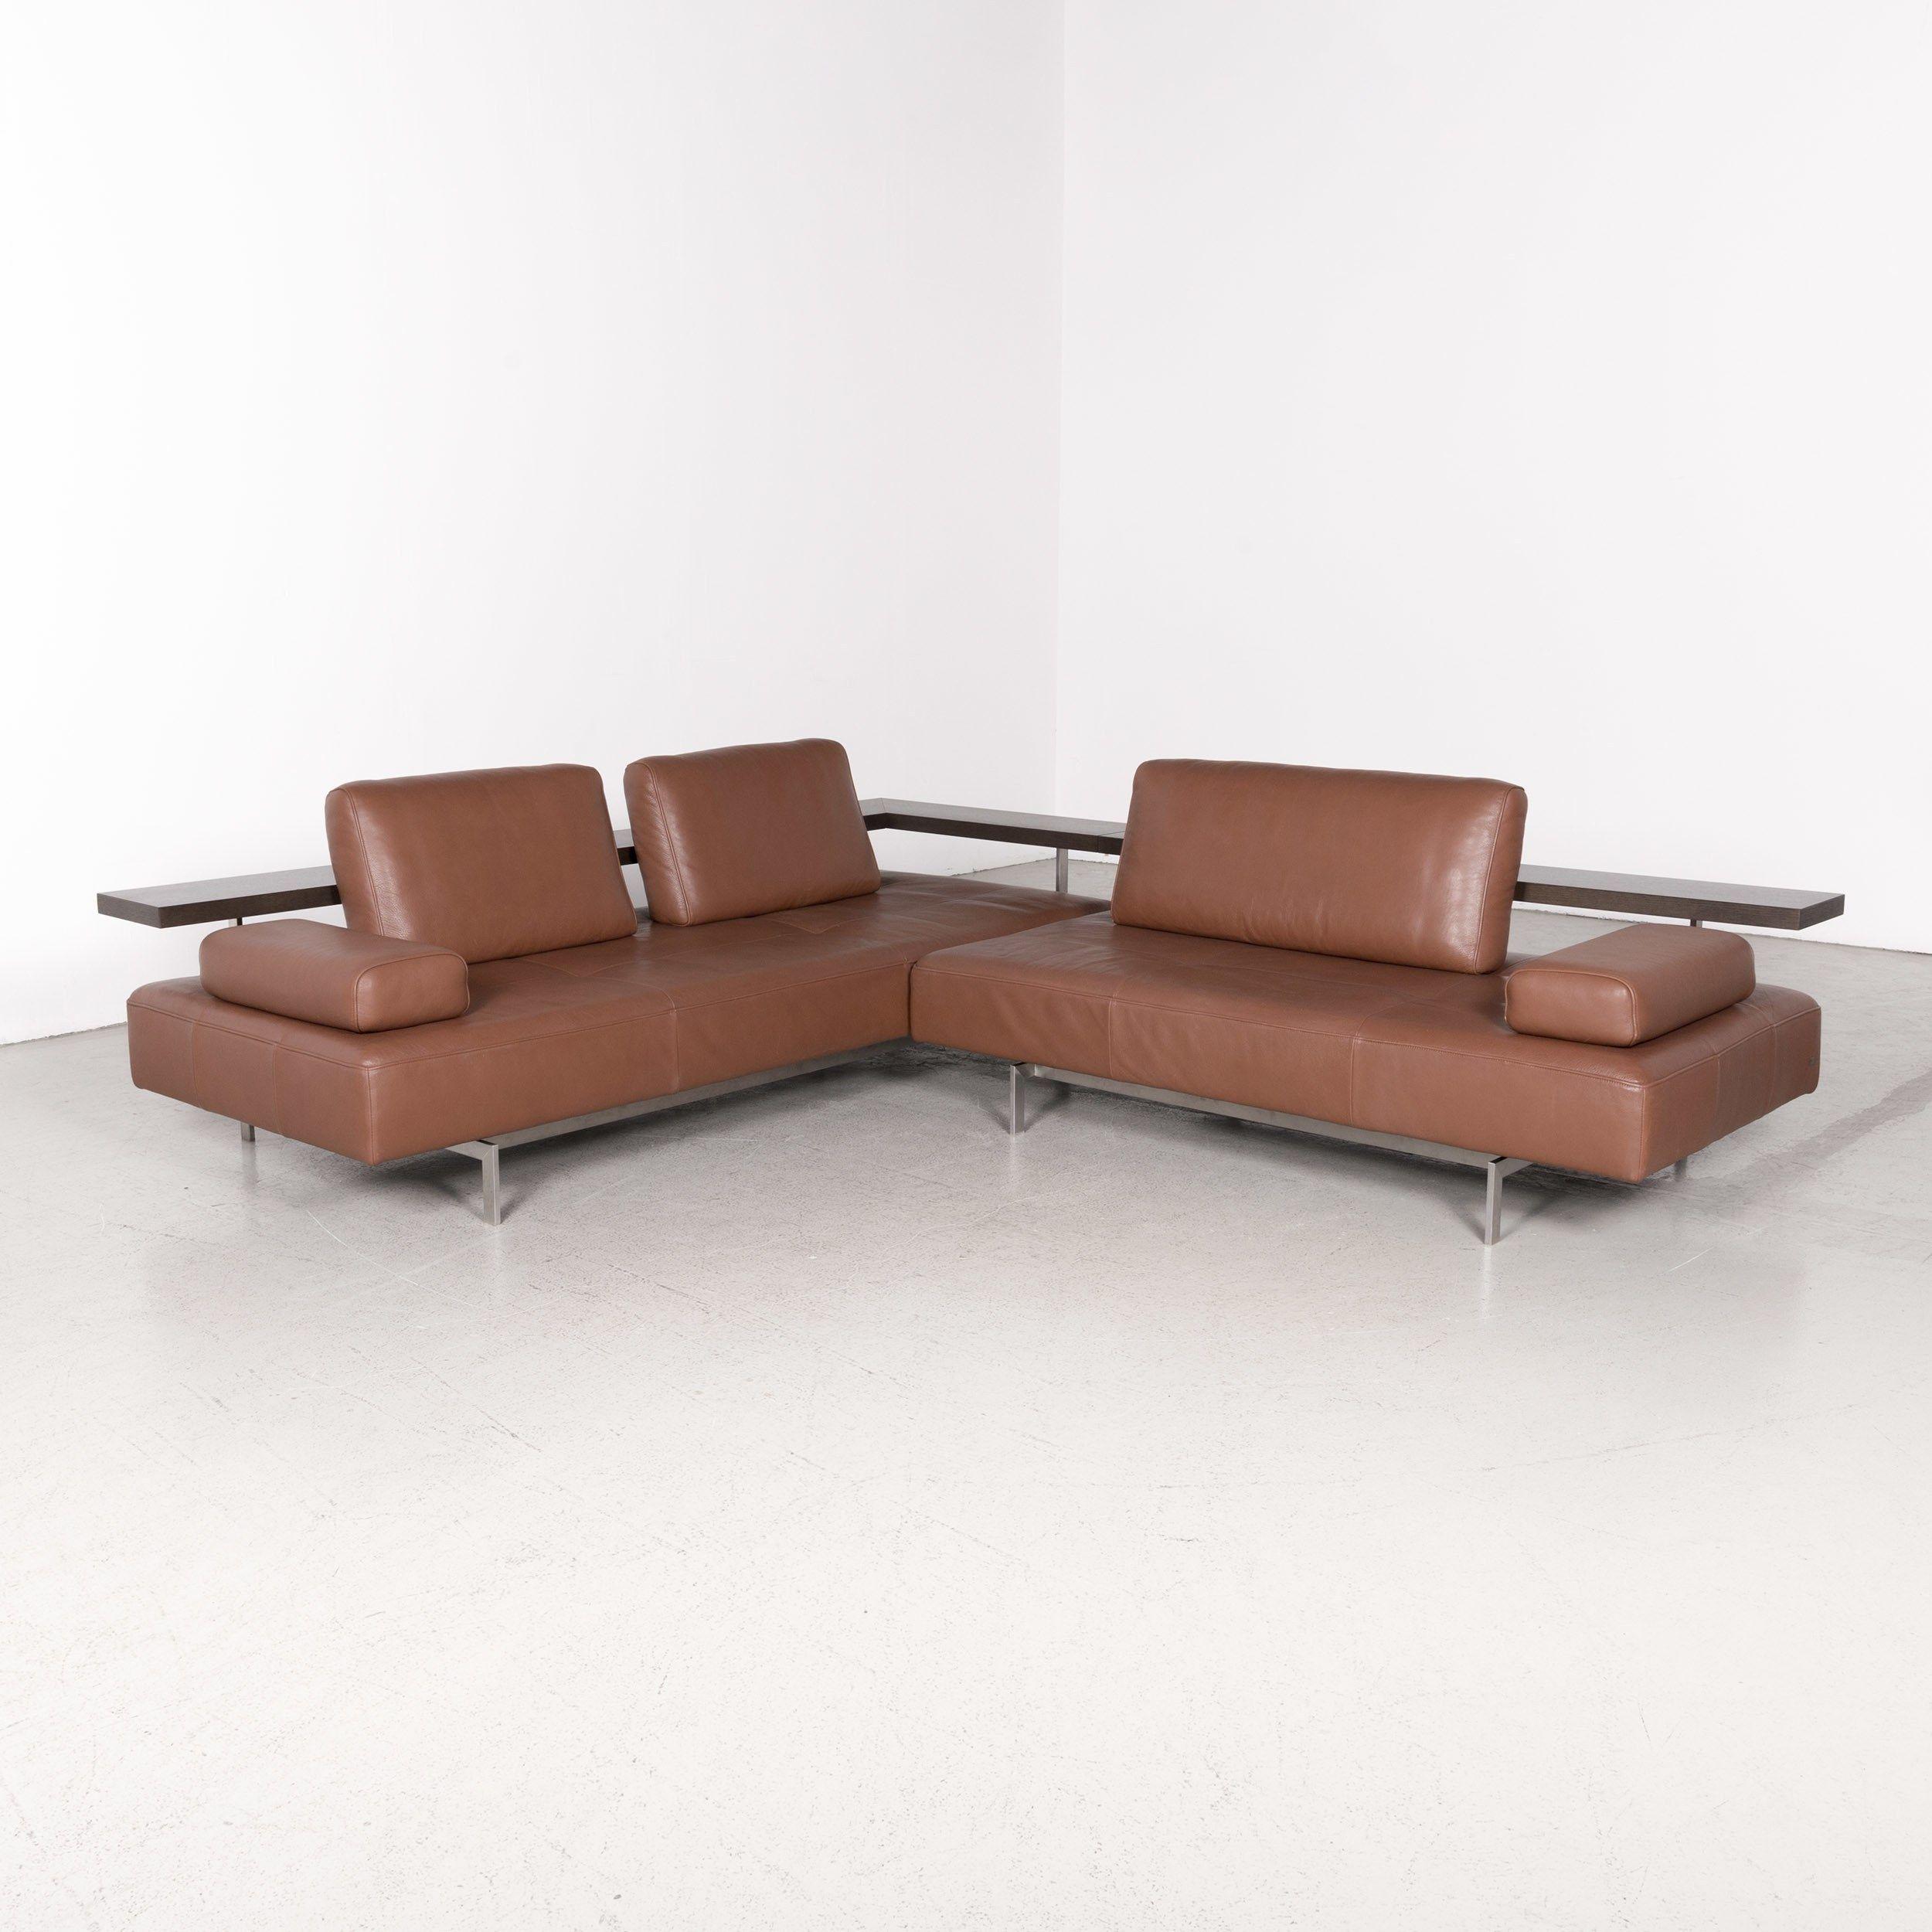 Dono Modular Sofa Rolf Benz Genuine Leather Rolf Benz Dono Designer